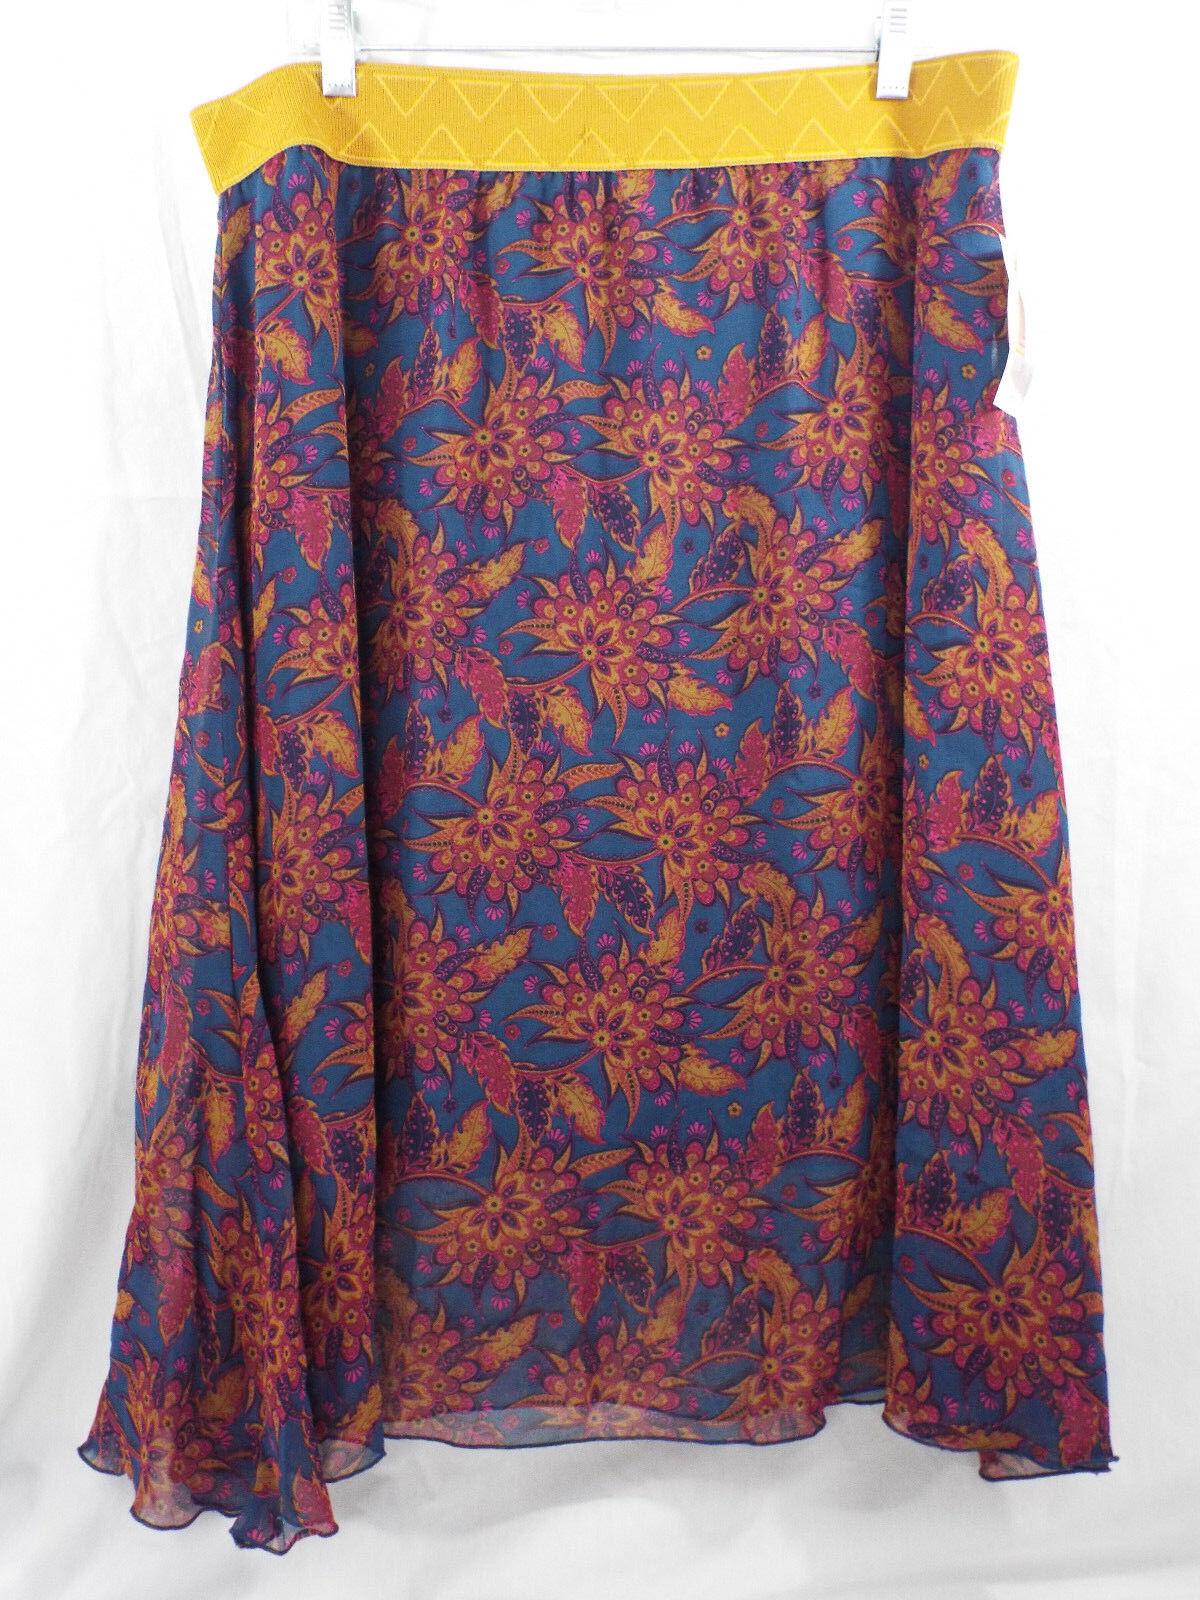 Women's LuLaRoe Lola Skirt 2XL gold Dark Teal Purple Brown NWT